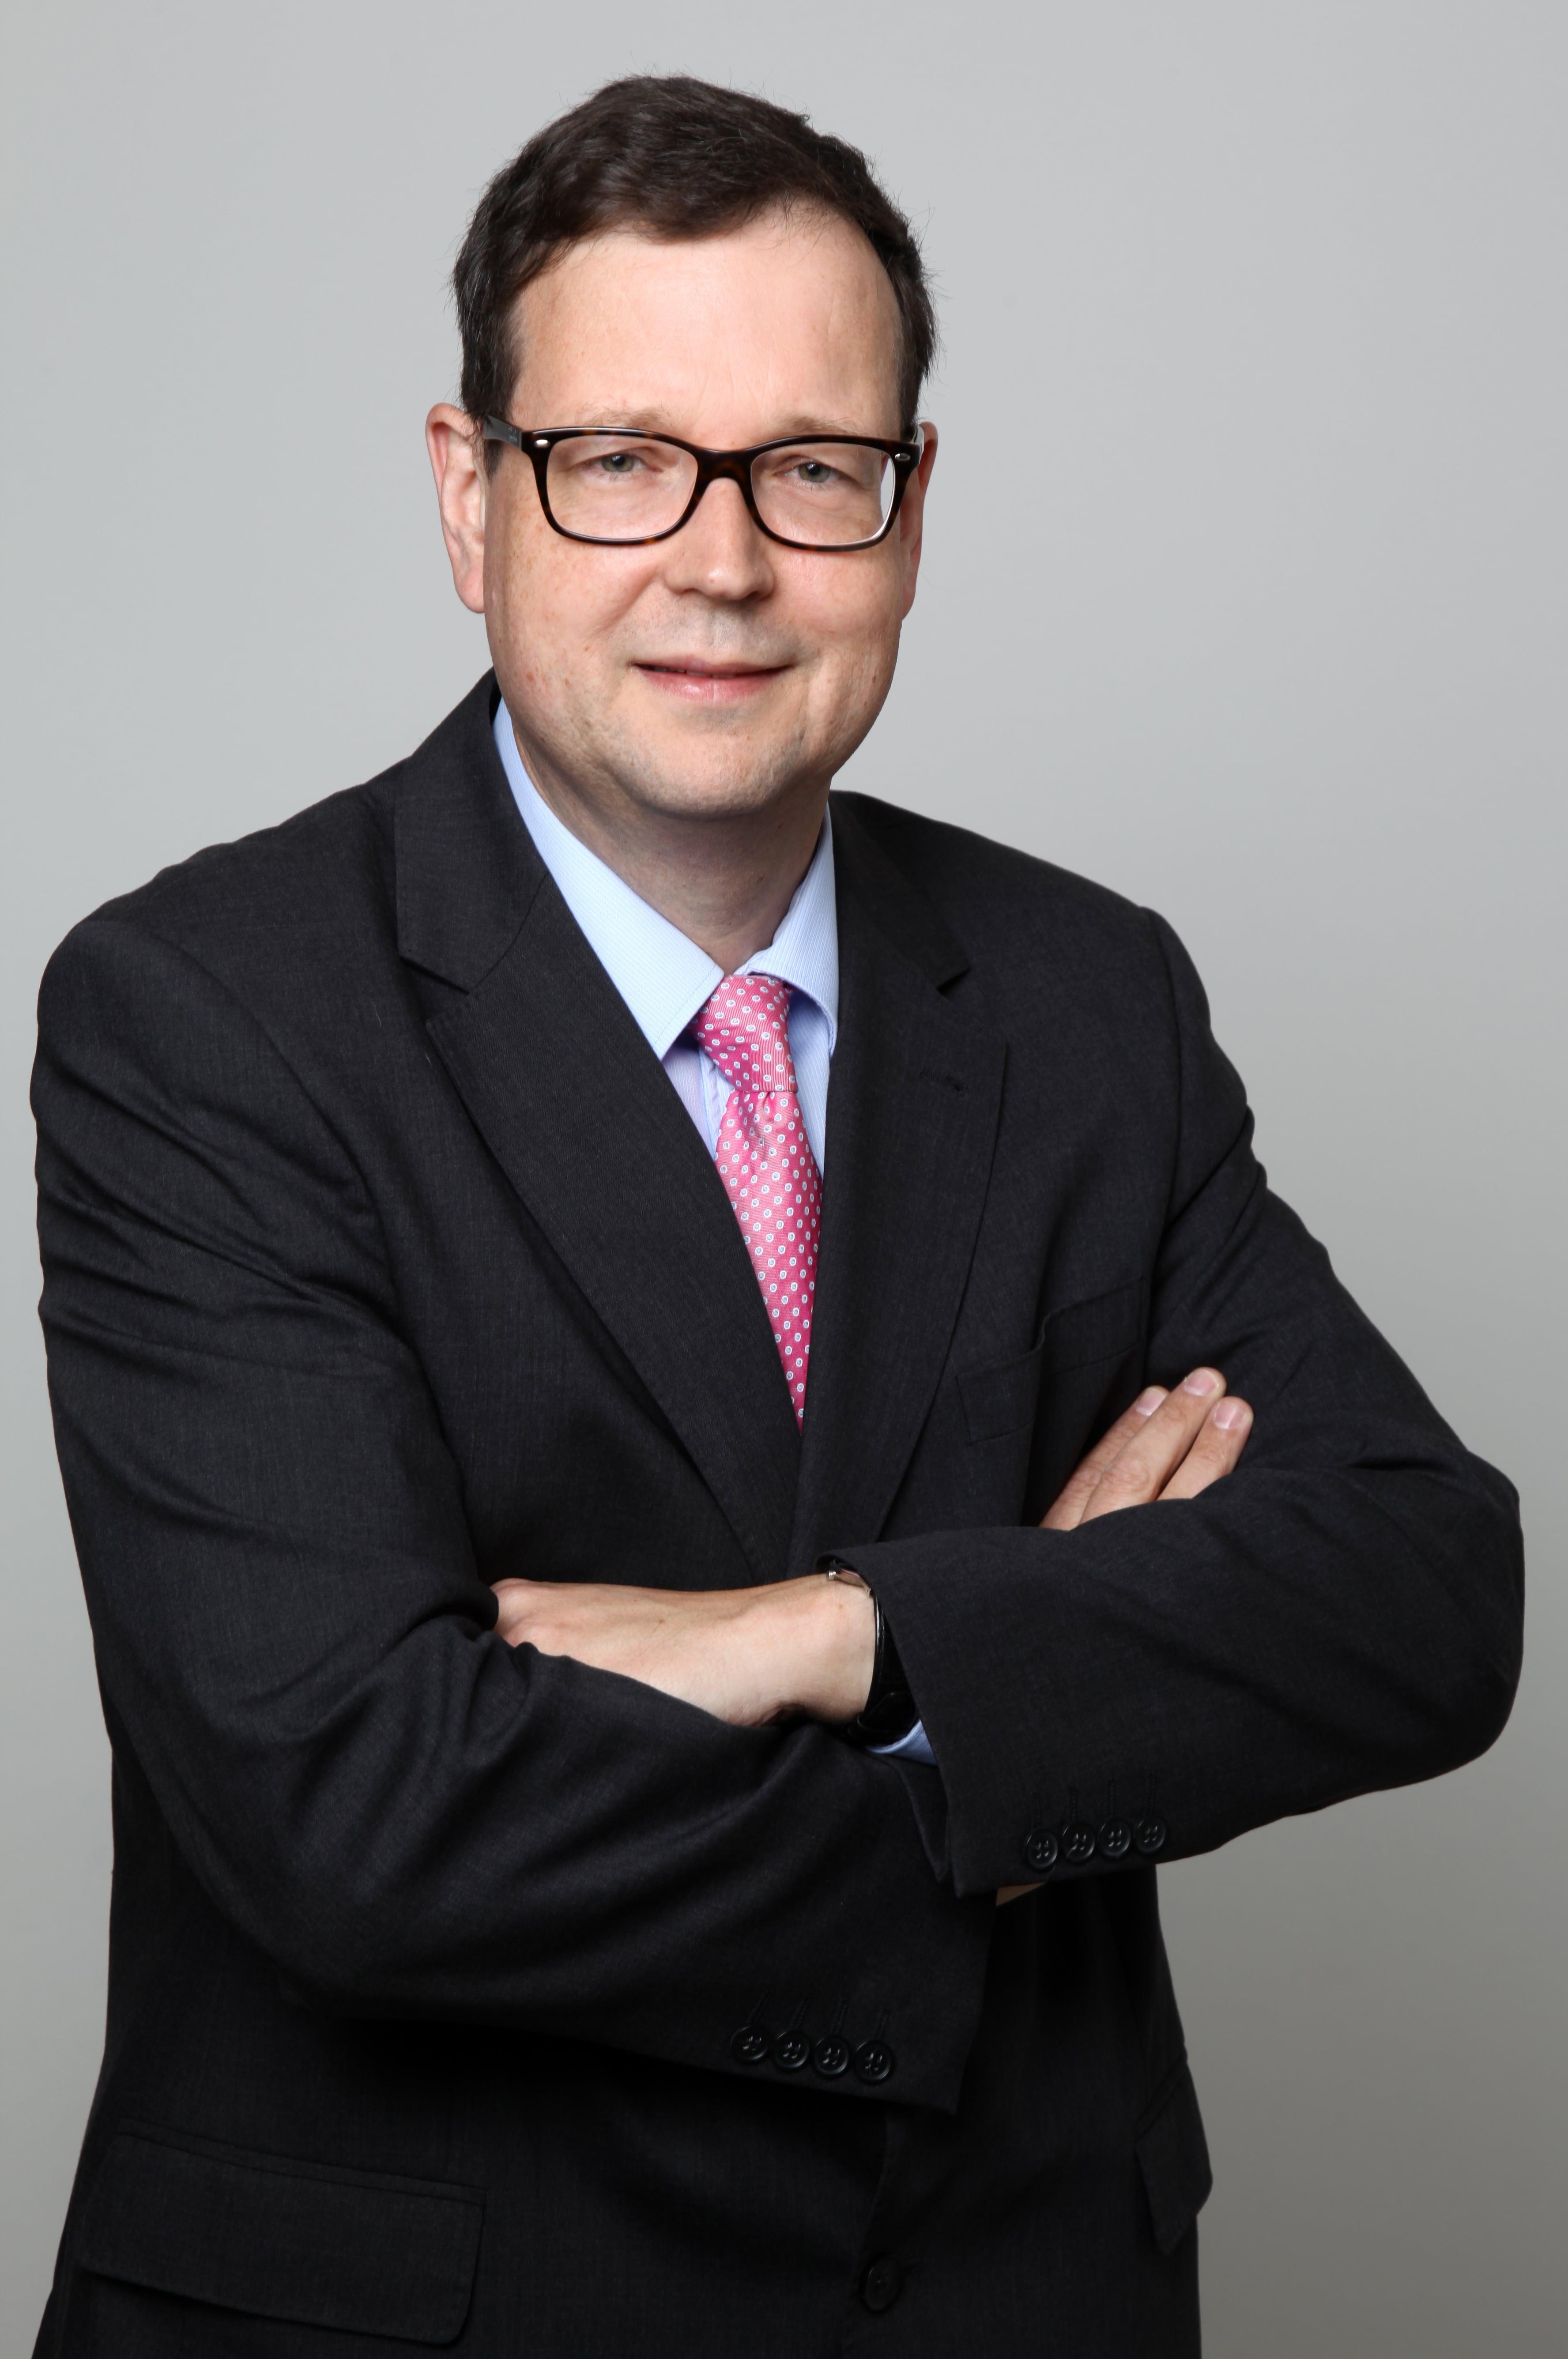 Dr. Michael Hinz